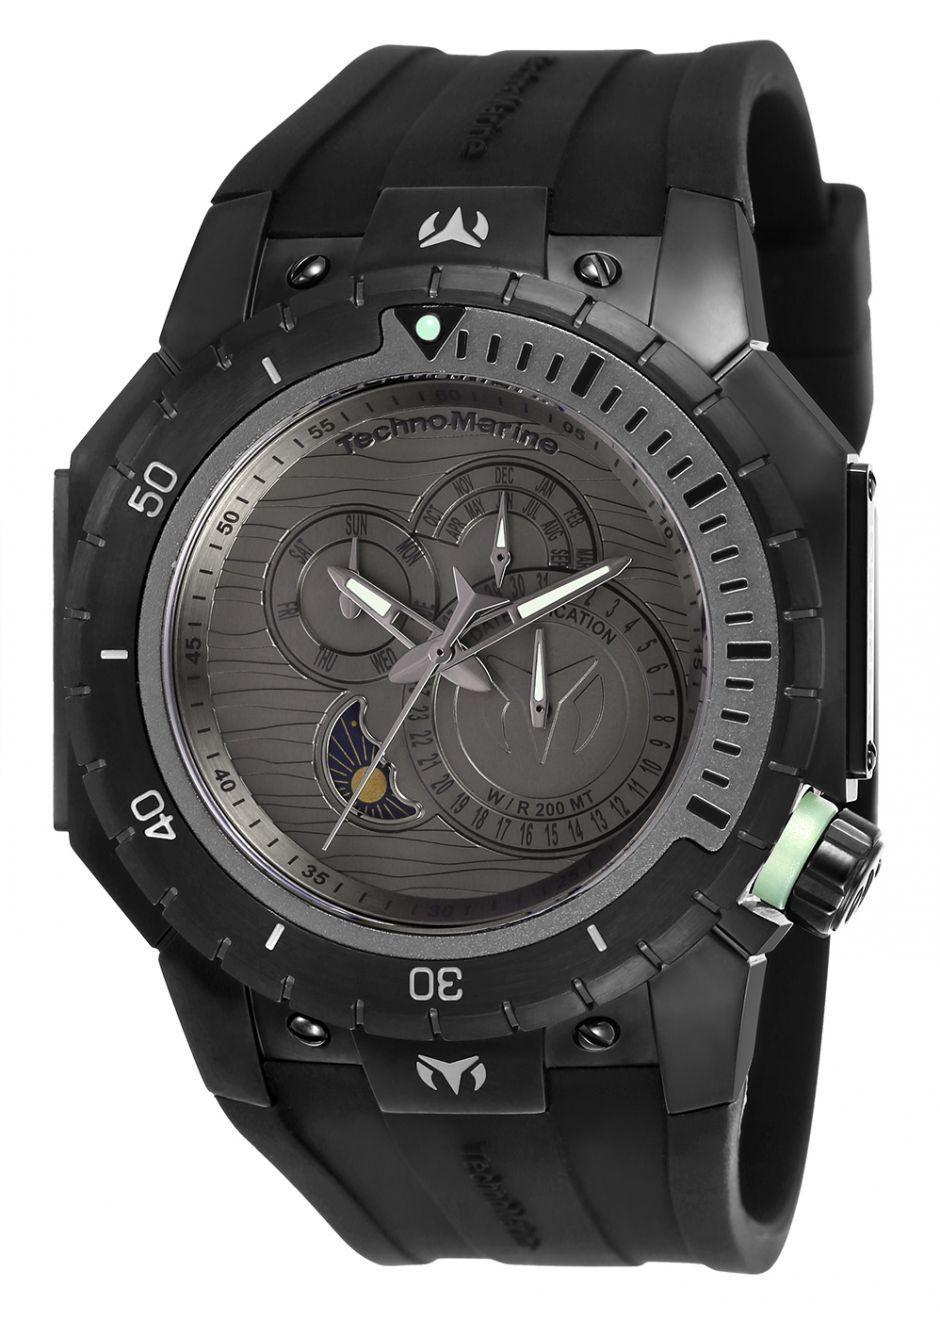 8285d1e38e30b Technomarine TM-216009 Mens Multifunction Watch 48mm Gunmetal Dial Manta  Diver Black Rubber Strap 200M